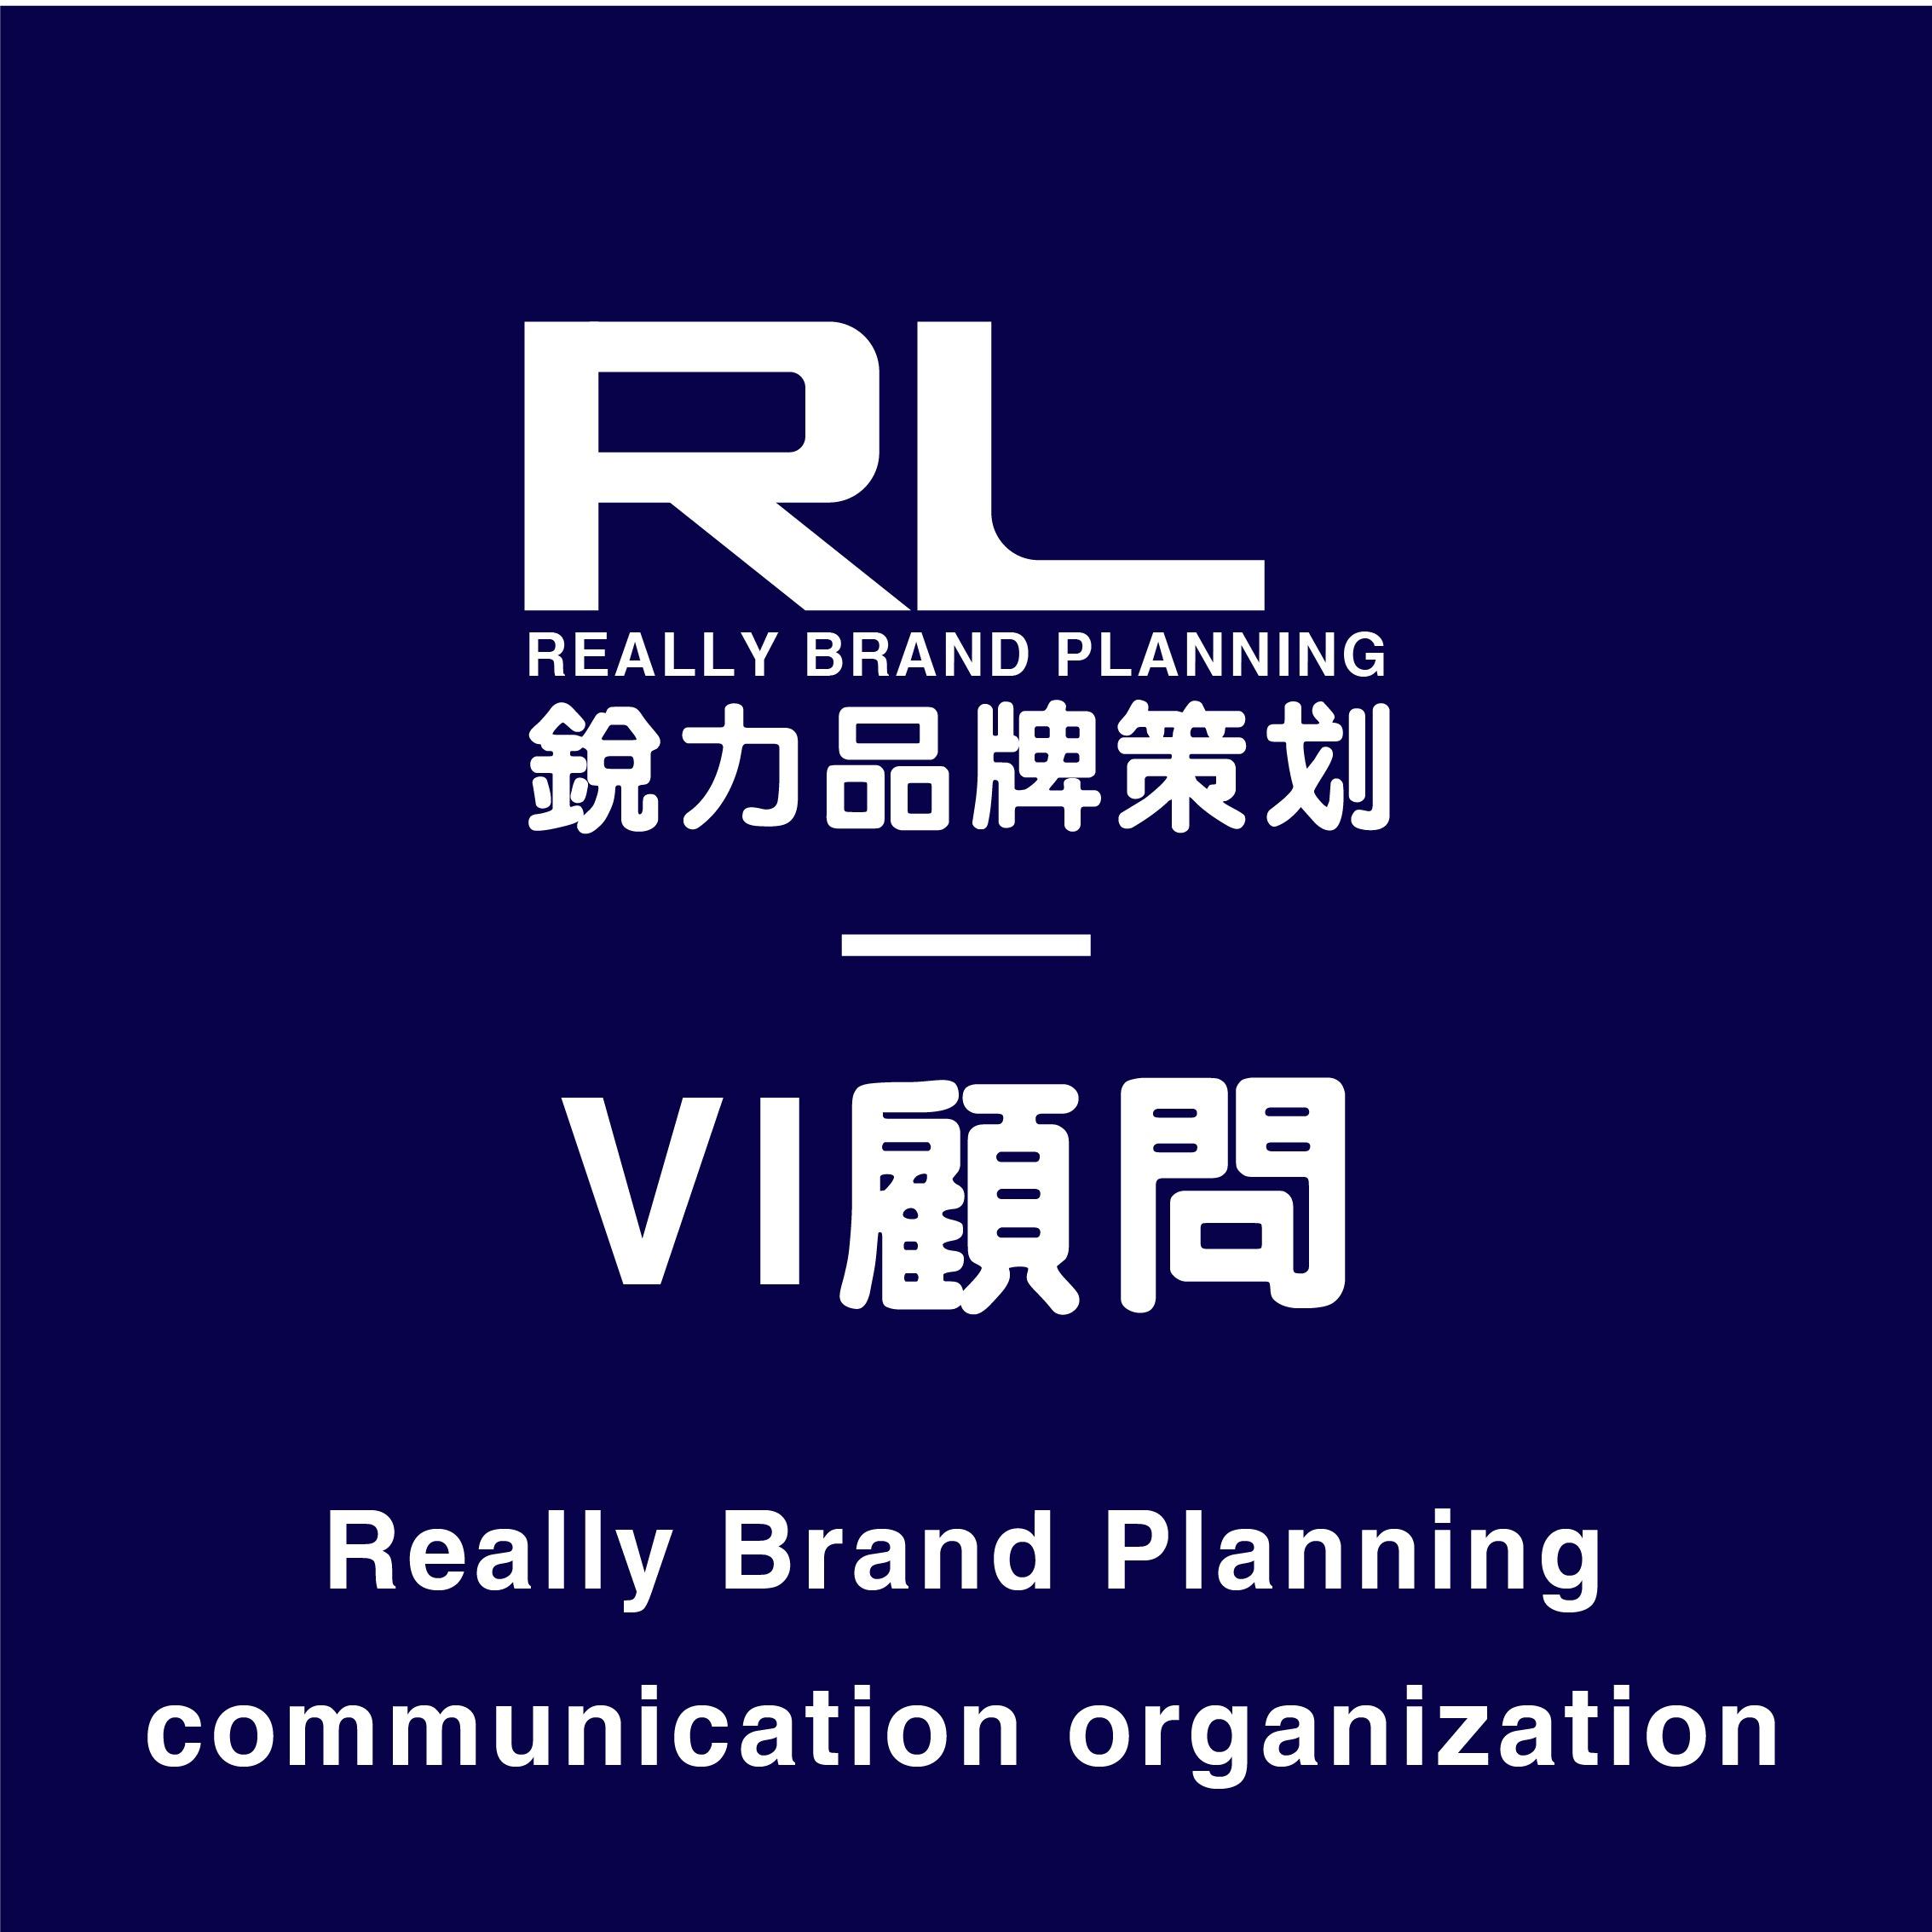 【VI顾问】VI设计VIS设计品牌形象办公系统设计餐饮VI